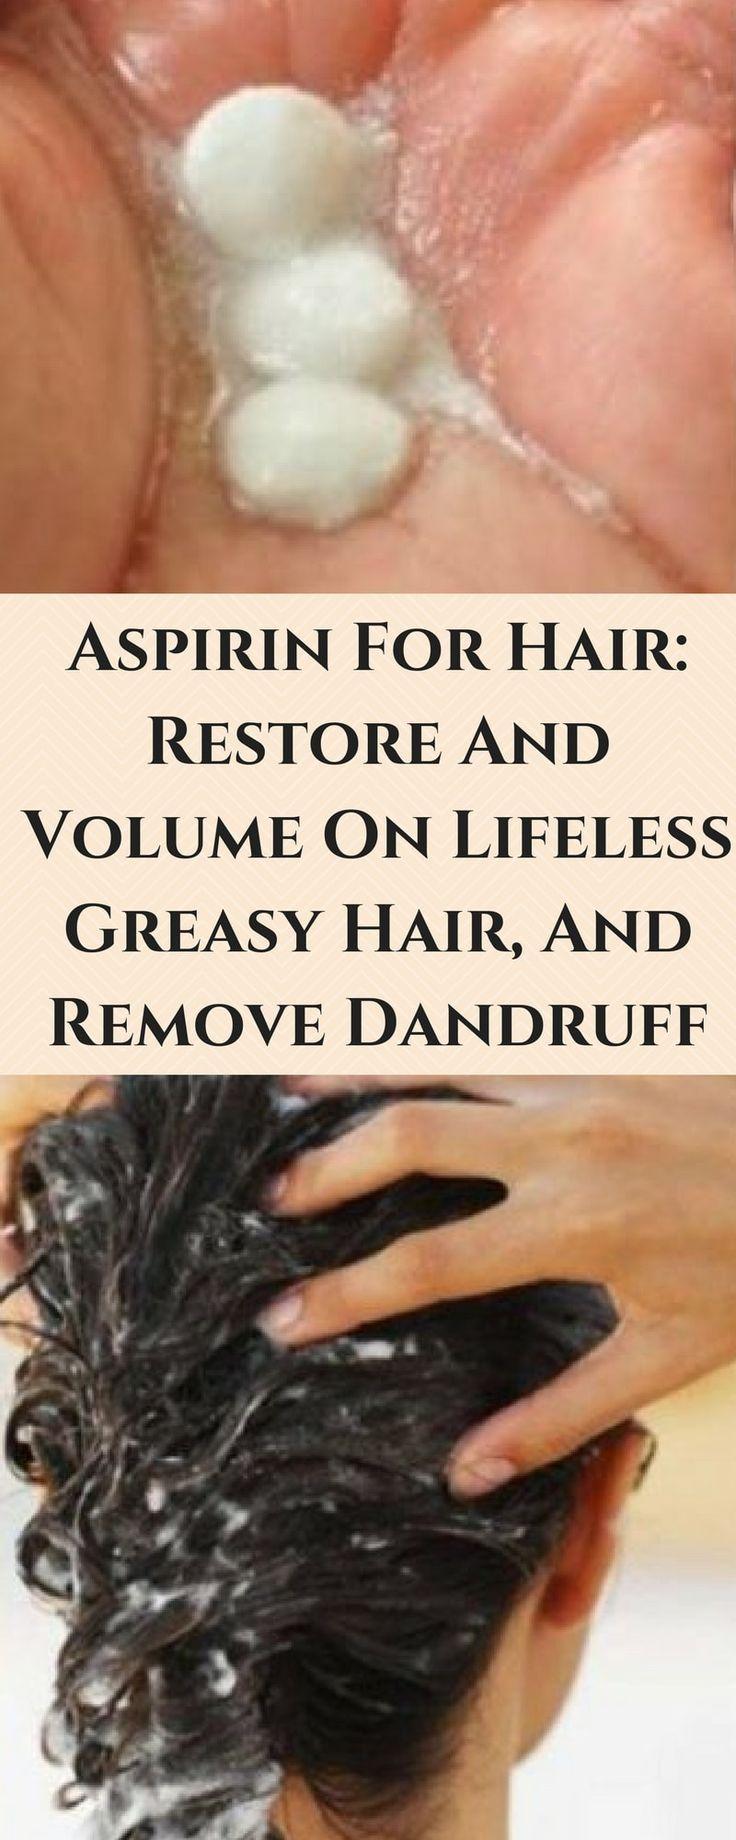 #aspirin#hair#homeremedy#healthy#dandruff